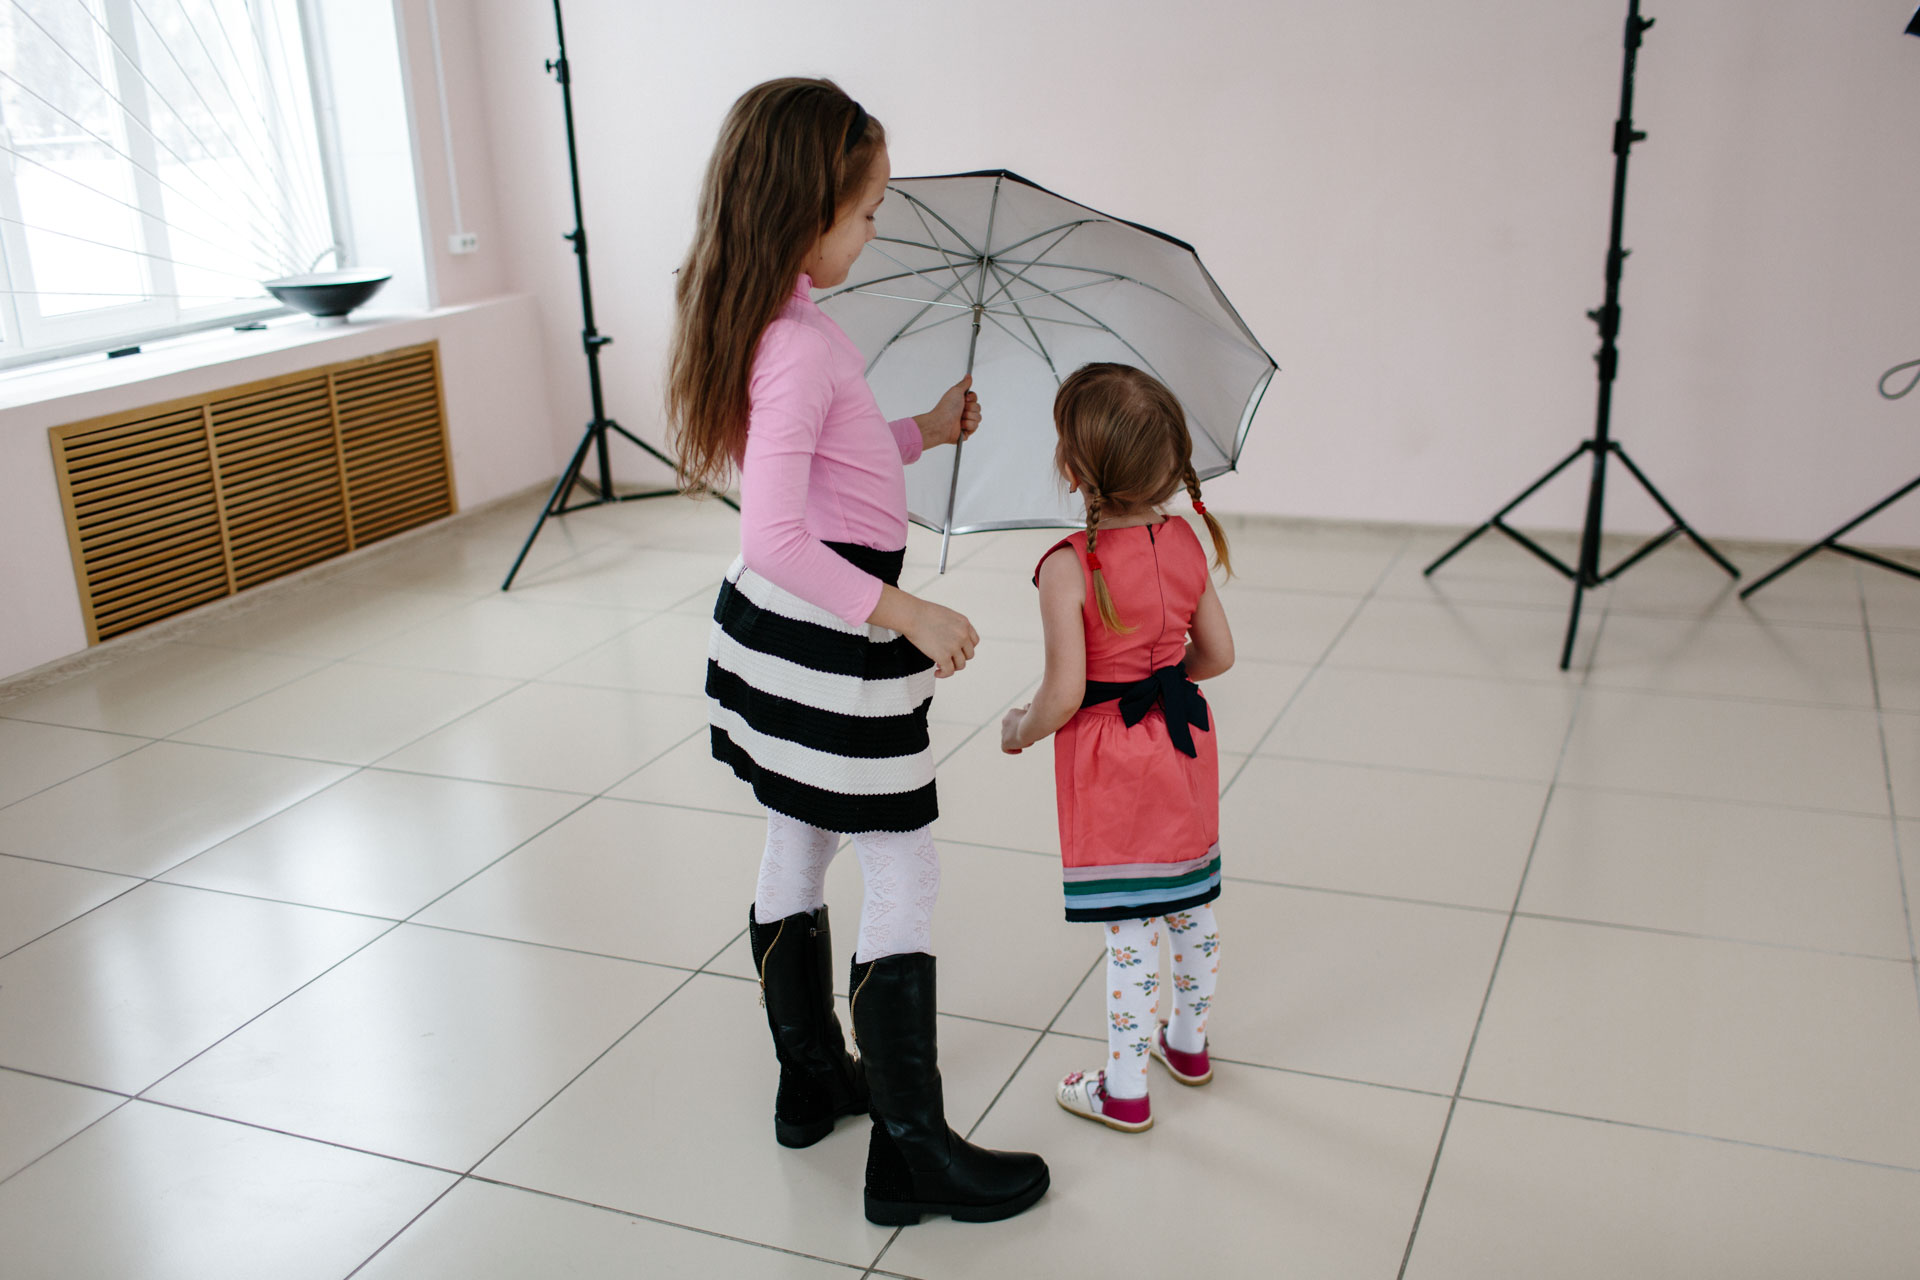 Ульяна и Варвара на записи видео для канала на YouTube